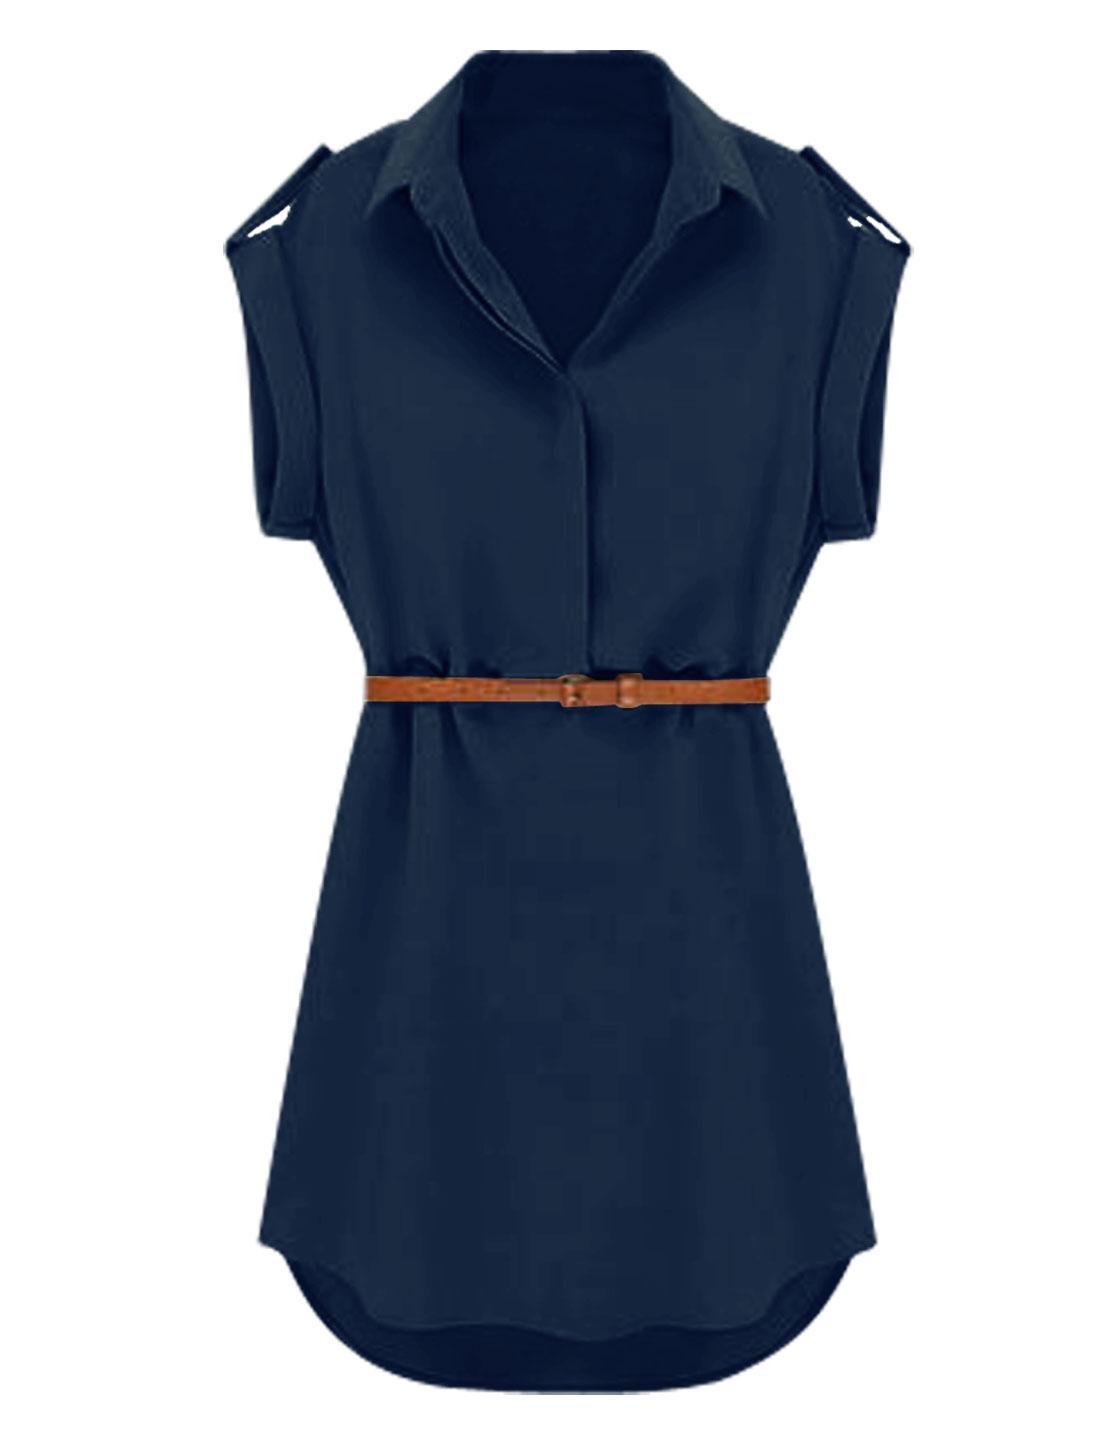 Lady Point Collar Short Sleeve 1/2 Placket Shirt Dress w Belt Navy Blue S